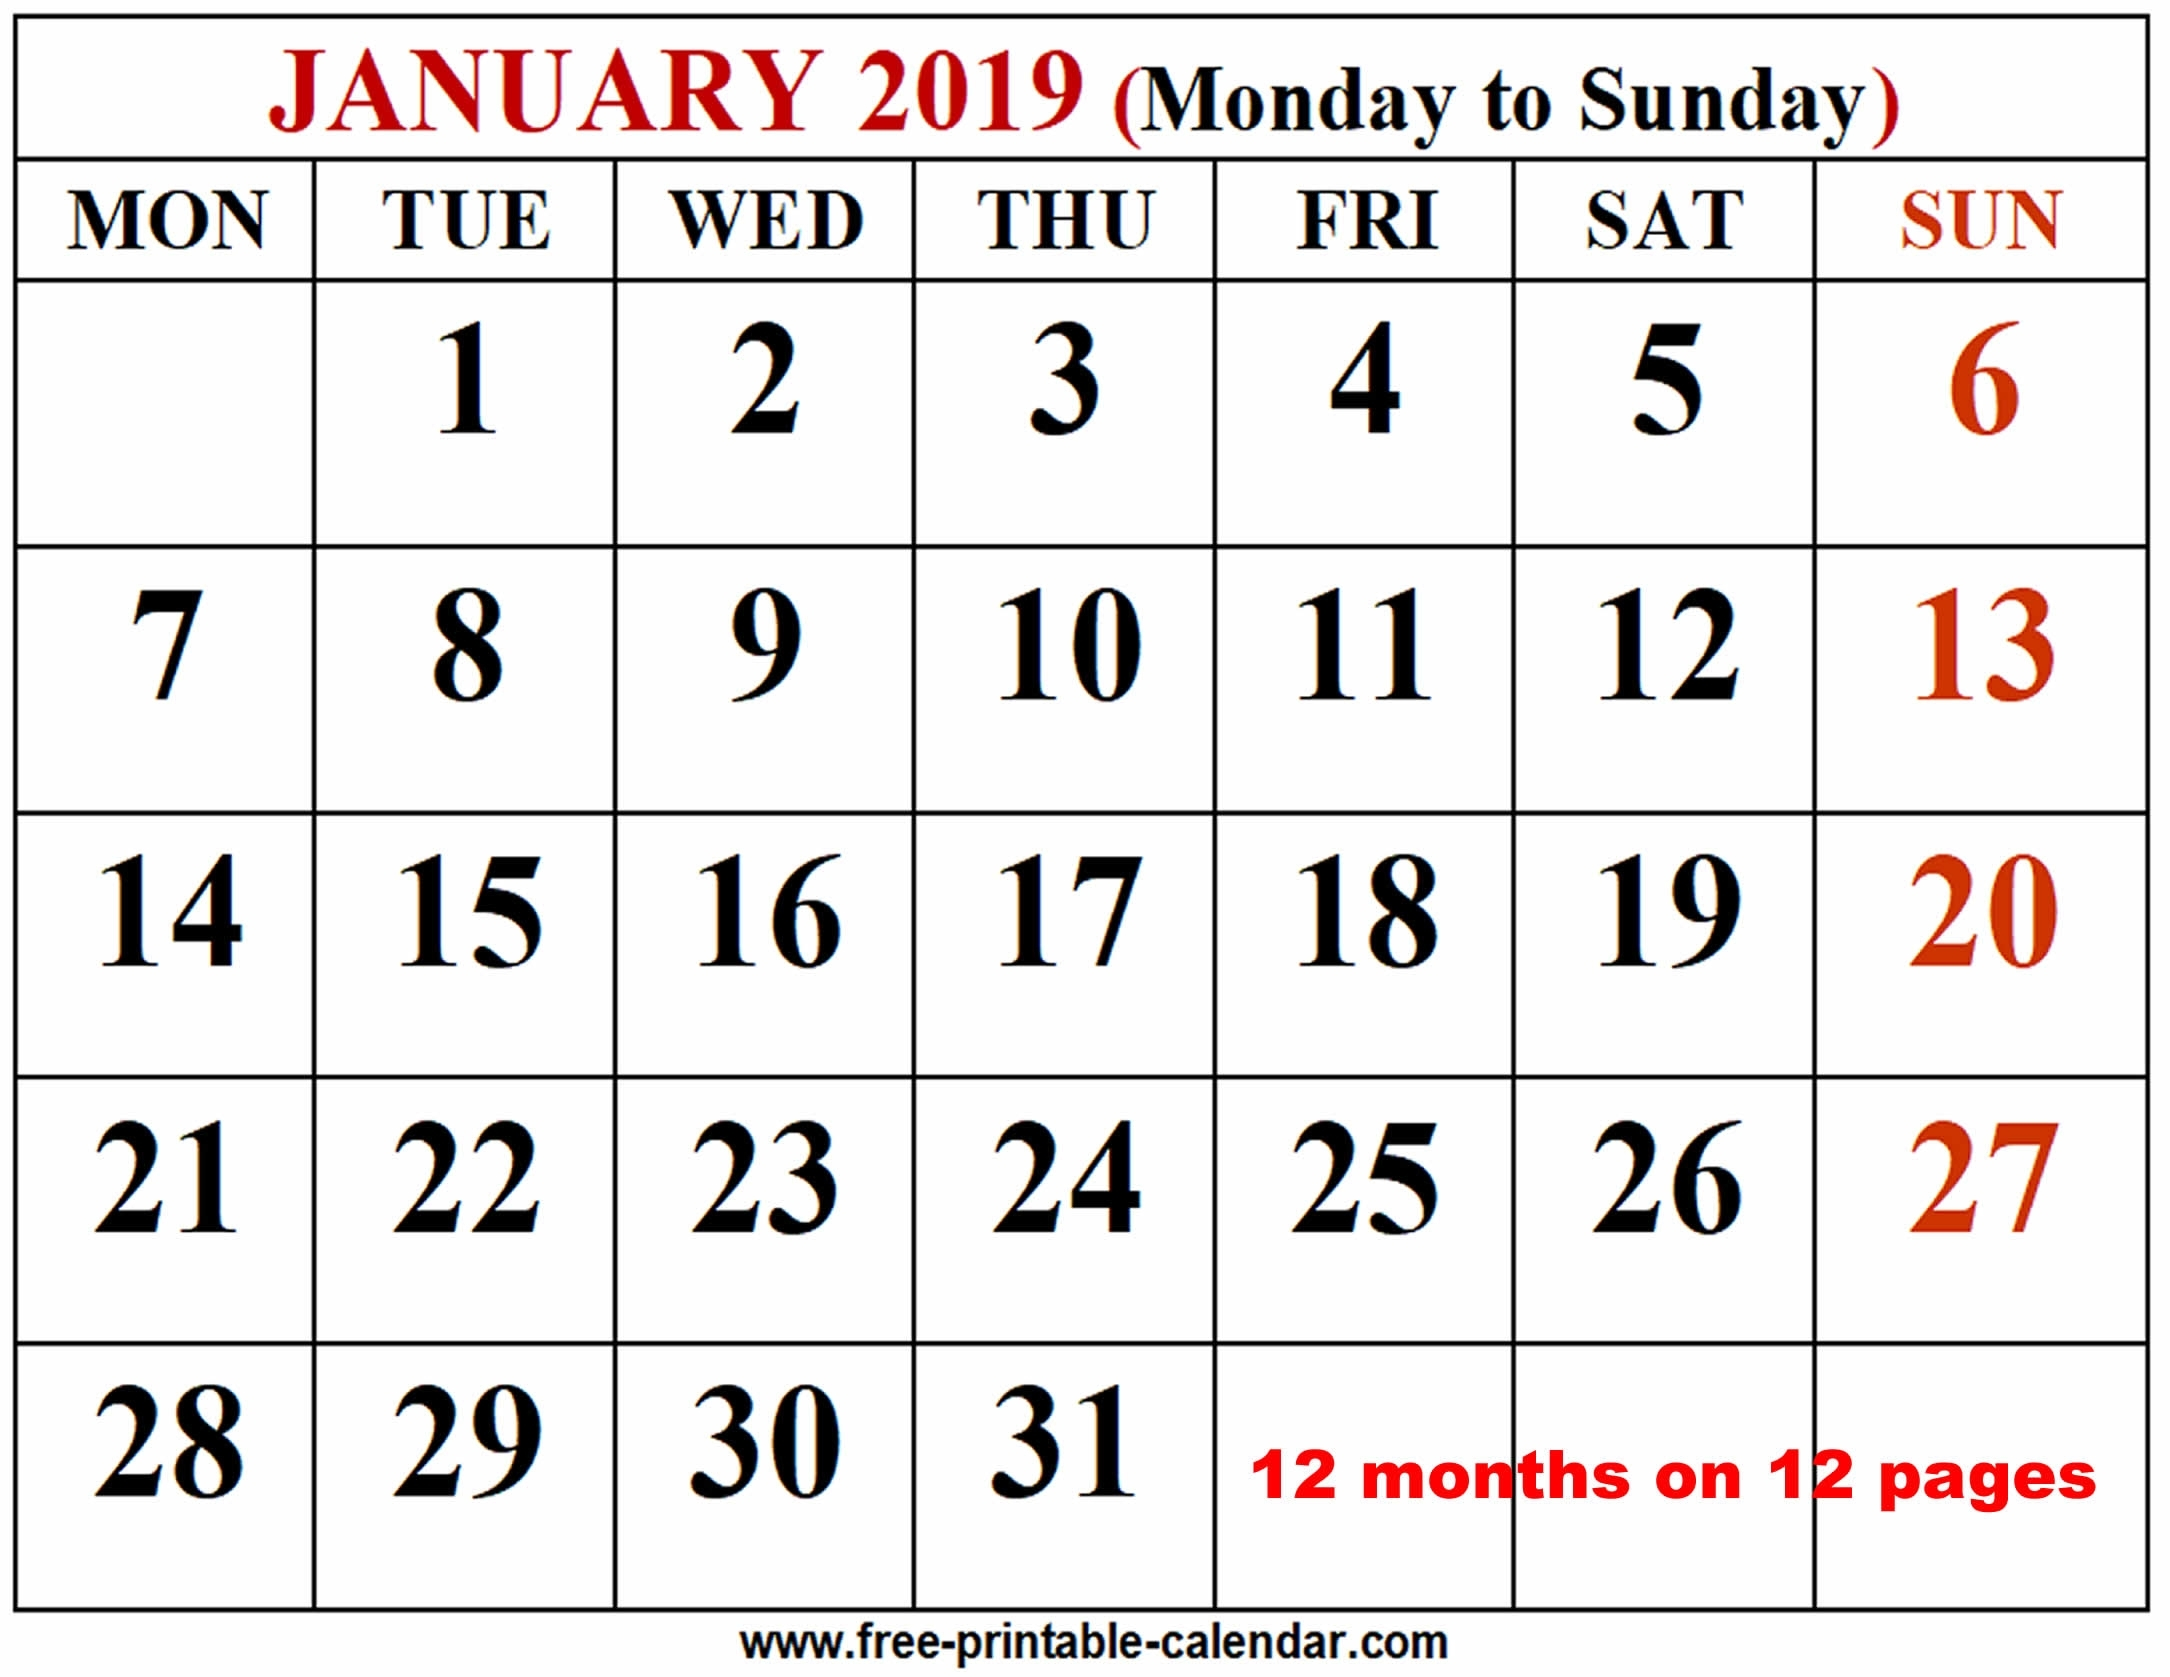 2019 Calendar Template - Free-Printable-Calendar